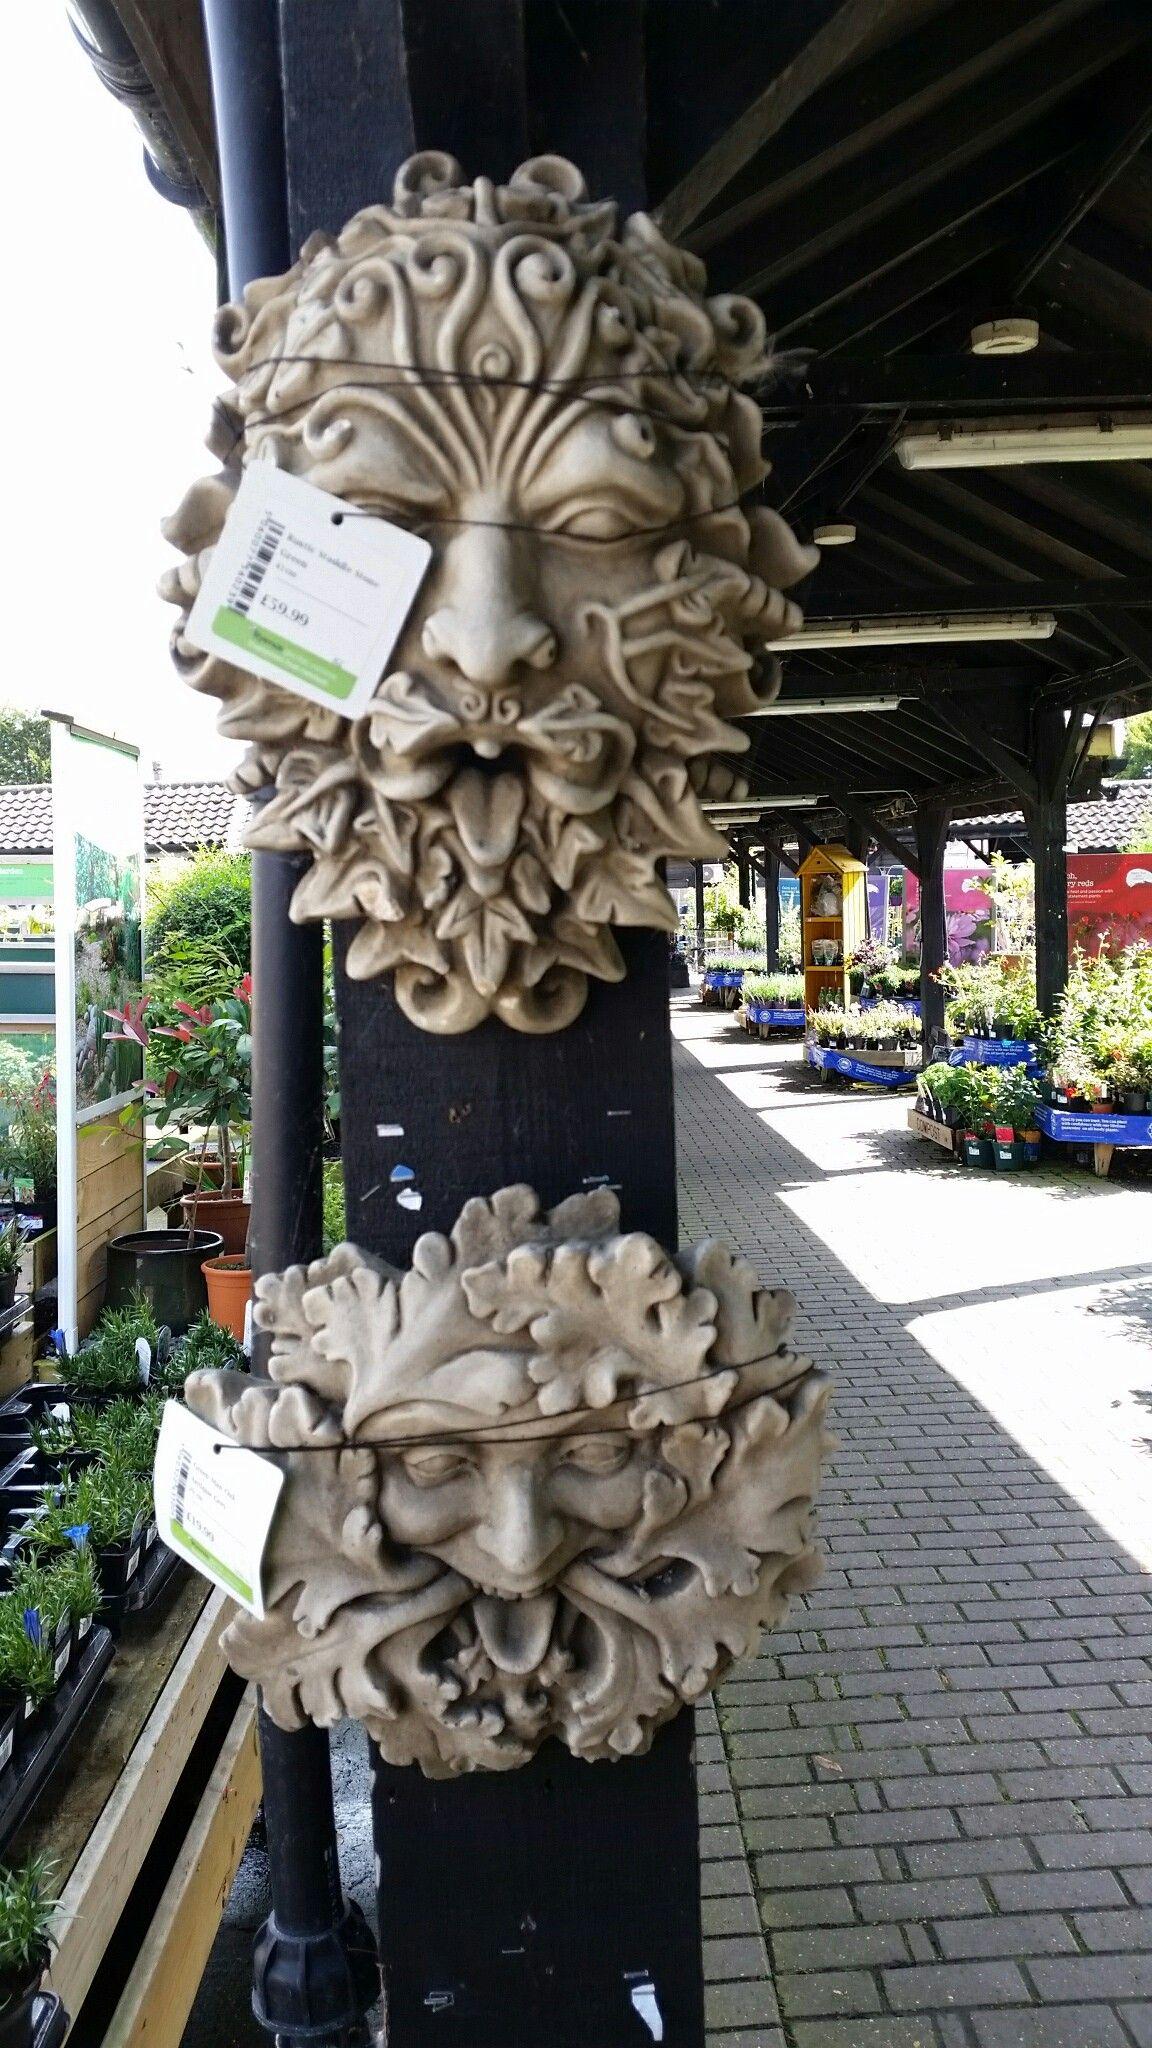 Garden wall ornaments - Green Man Ornaments For Garden Walls In A Garden Centre In Enfield